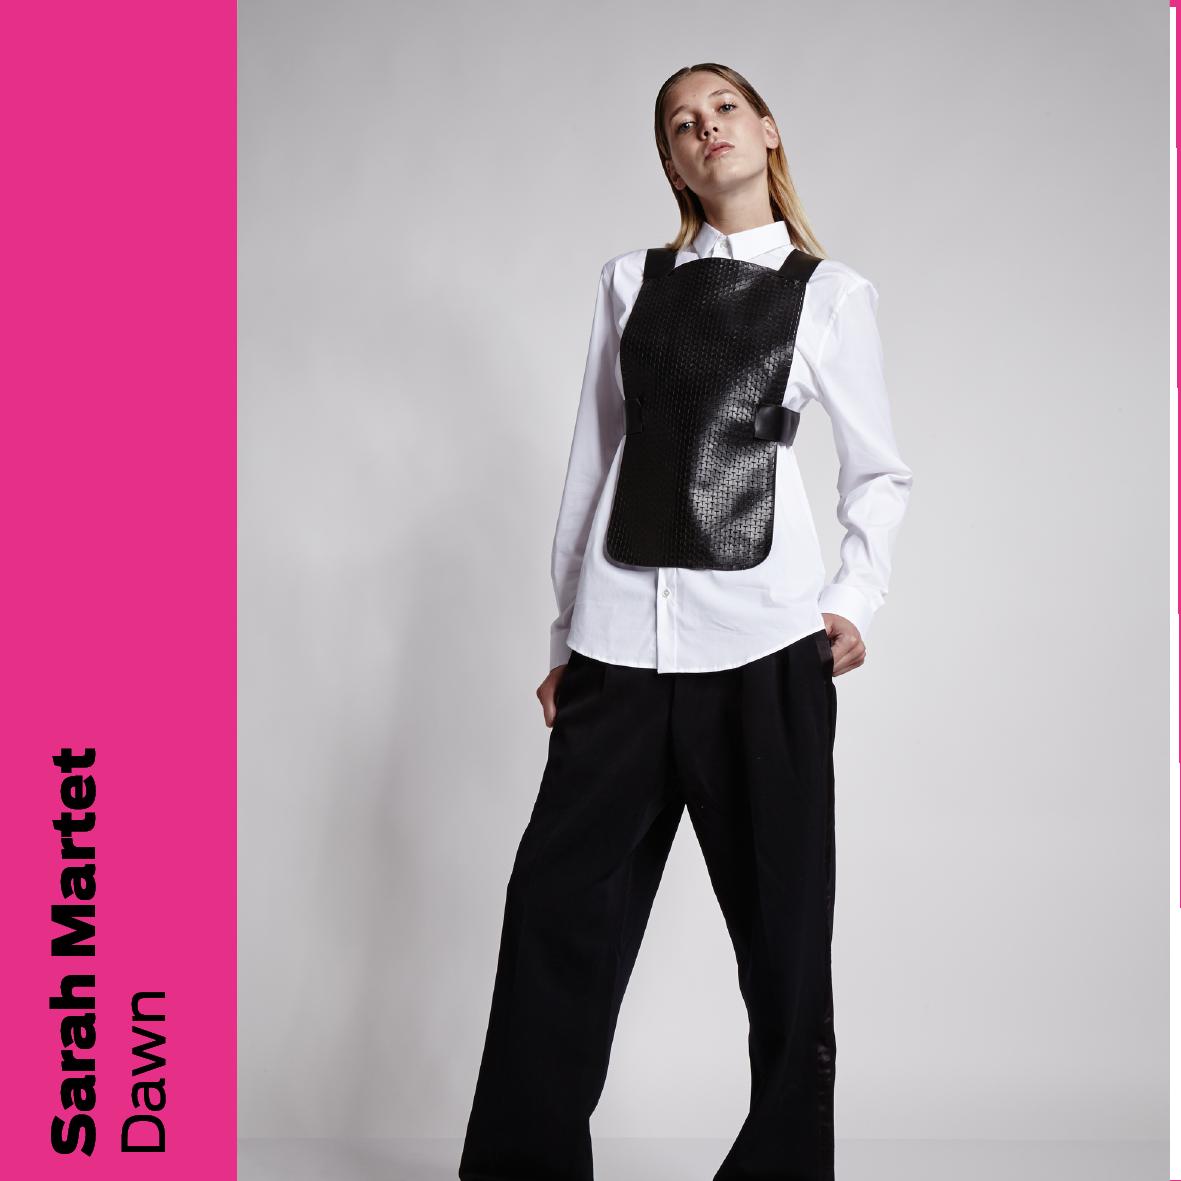 Sarah Martet (DK): Dawn - et multifunktionelt læderdesign / Dawn - a multifunctional leather design